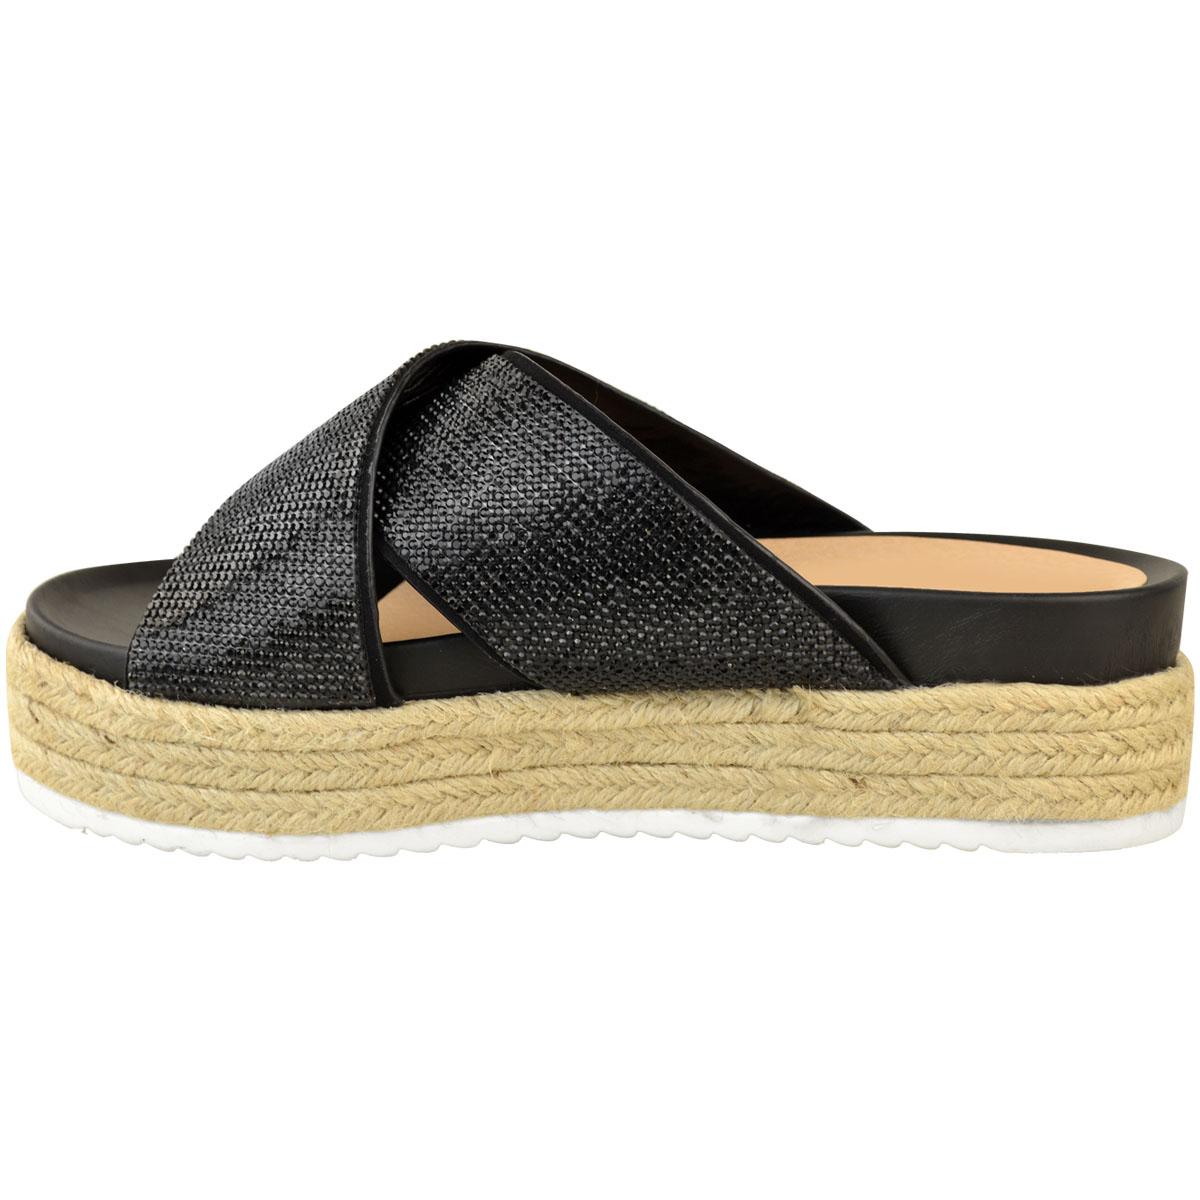 Womens-Ladies-Diamante-Slip-On-Sandals-Flatforms-Sparkly-Platform-Summer-Size-UK thumbnail 5